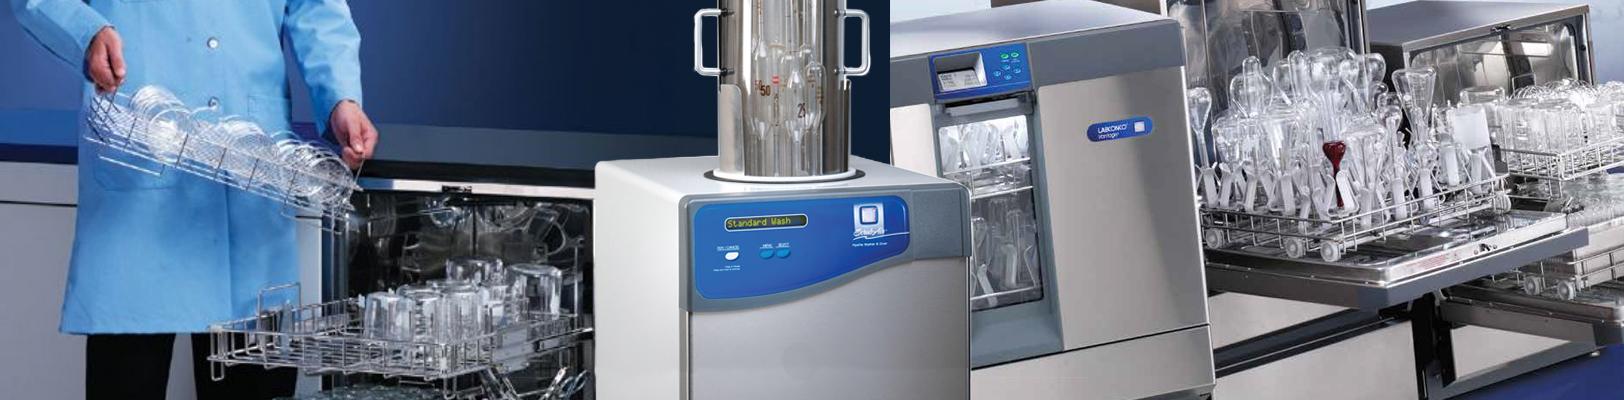 Washing & Sterilization Equipment